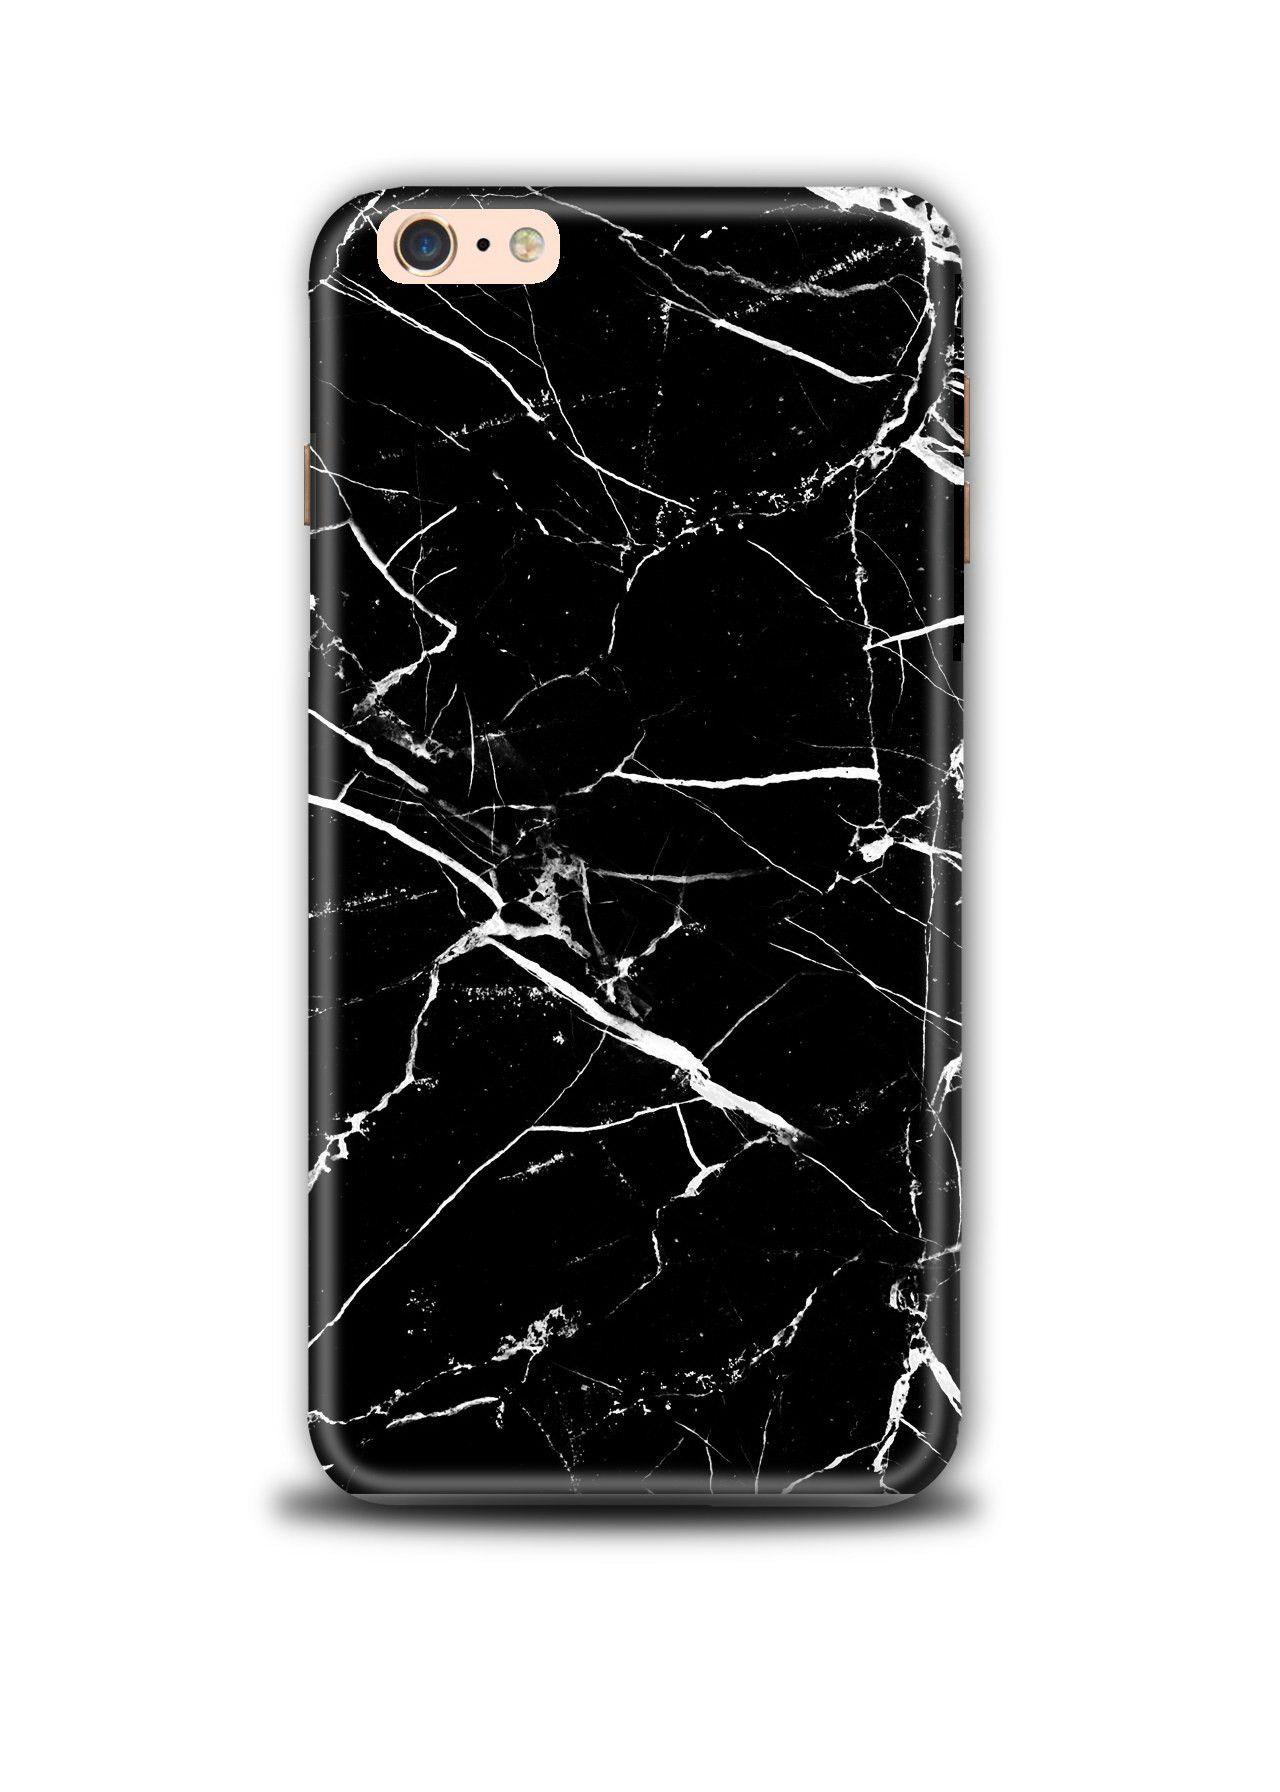 watch 8e9fd 31537 Black & White Marble iPhone 6 Plus/6s Plus Case